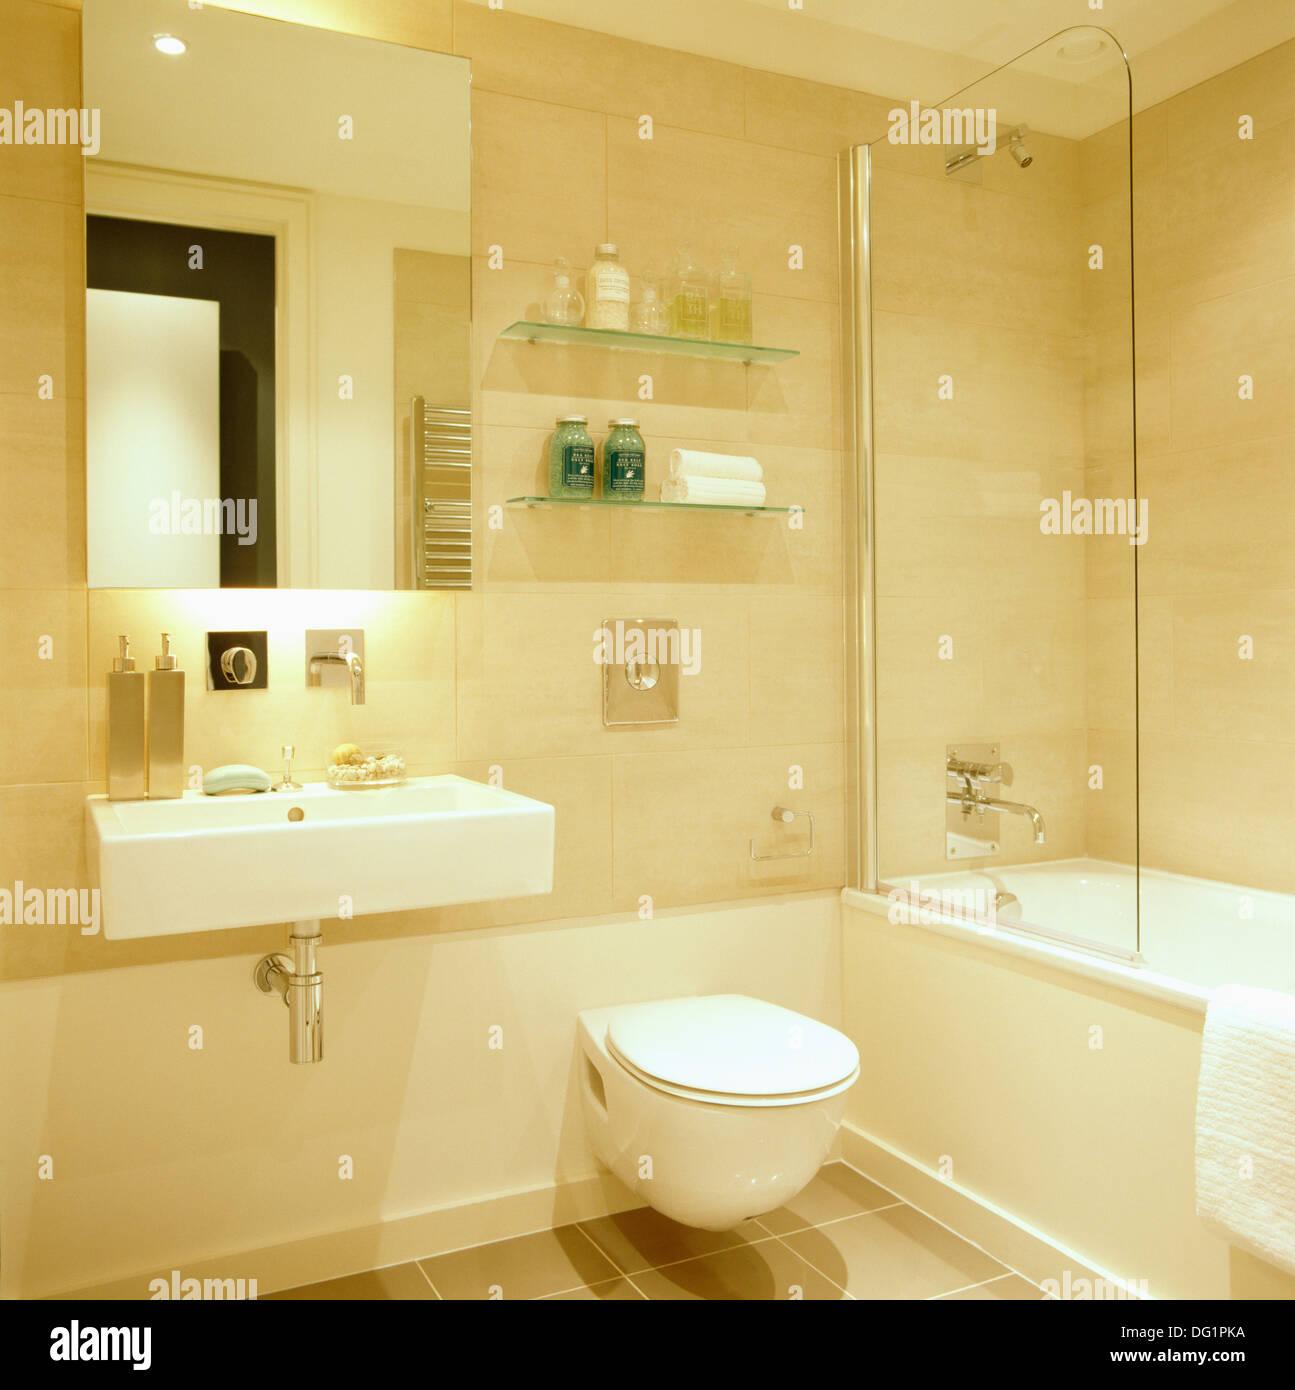 Mirror above rectangular basin in modern city bathroom